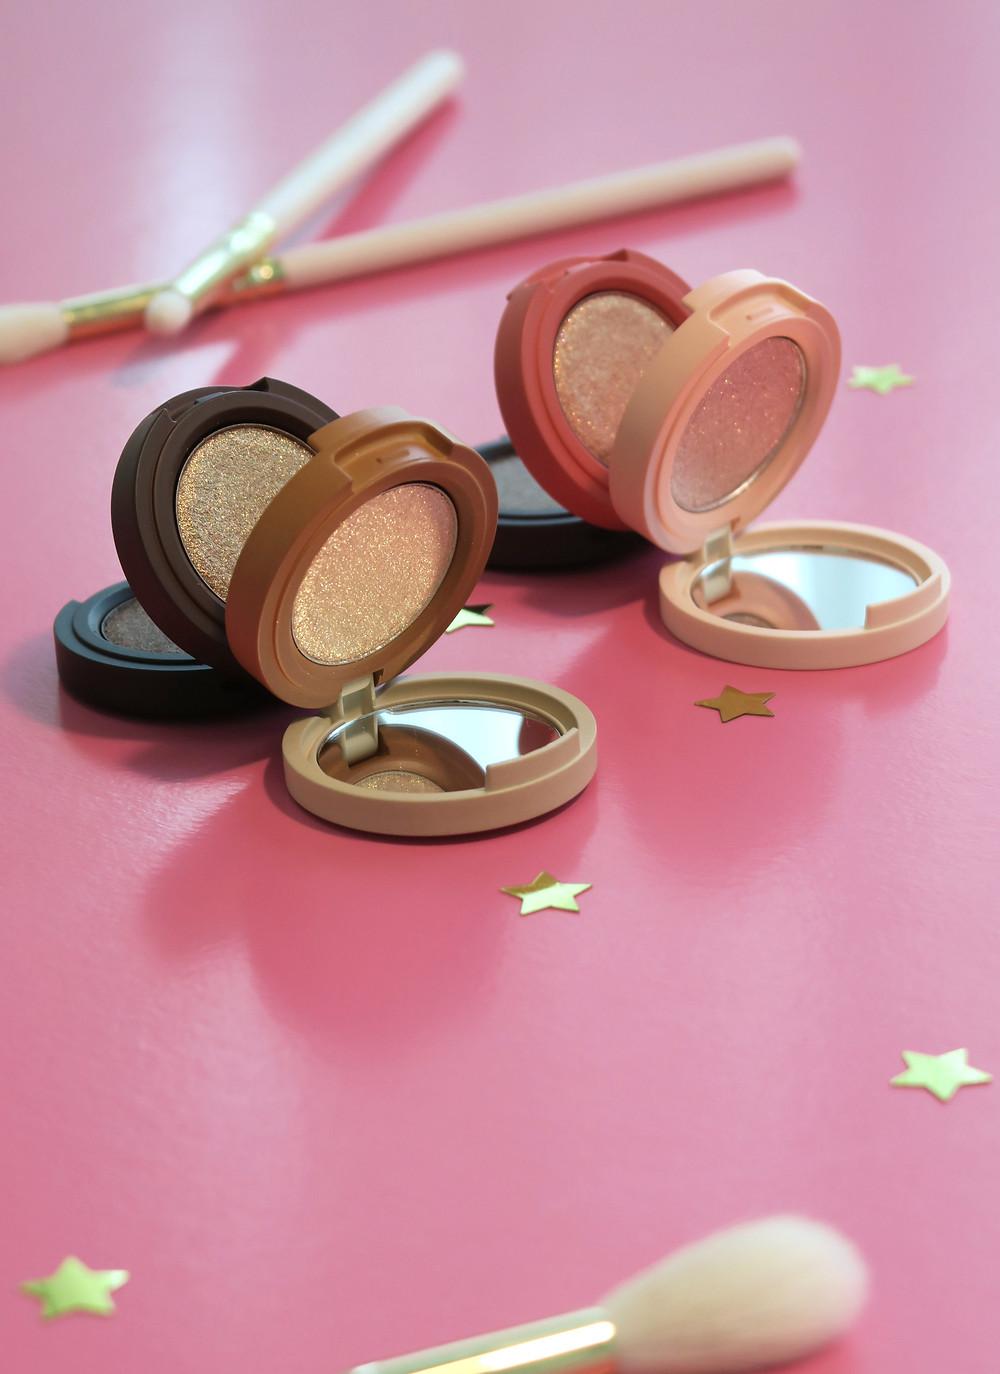 kaja beauty bento bouncy shimmer eyeshadow trio review